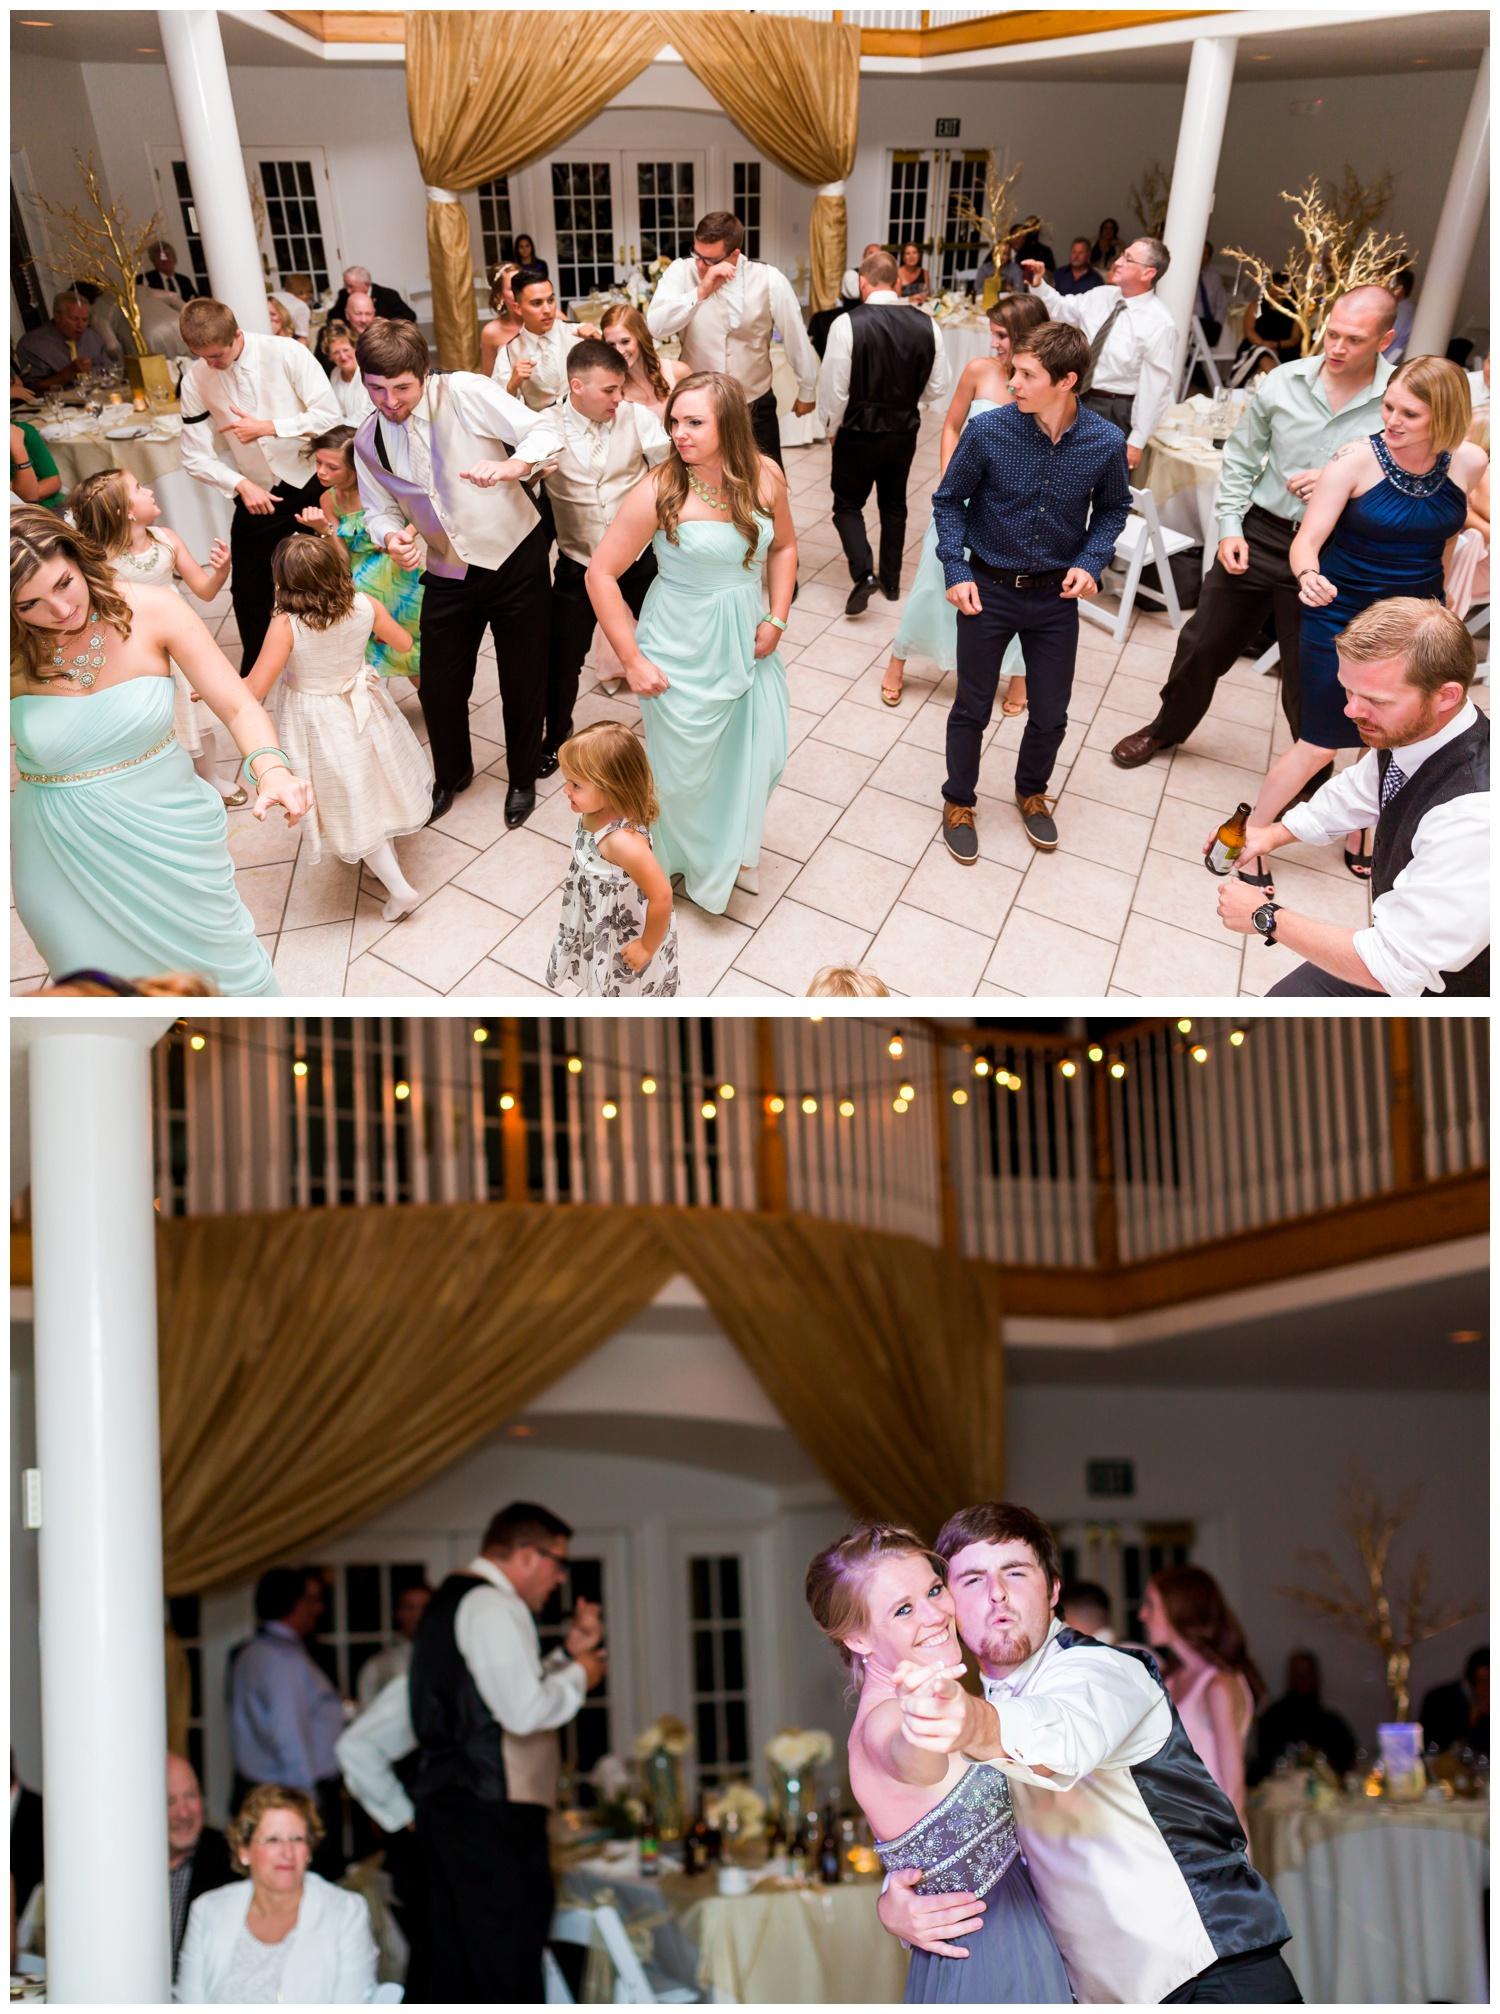 lionscrest manor wedding photography51.jpg